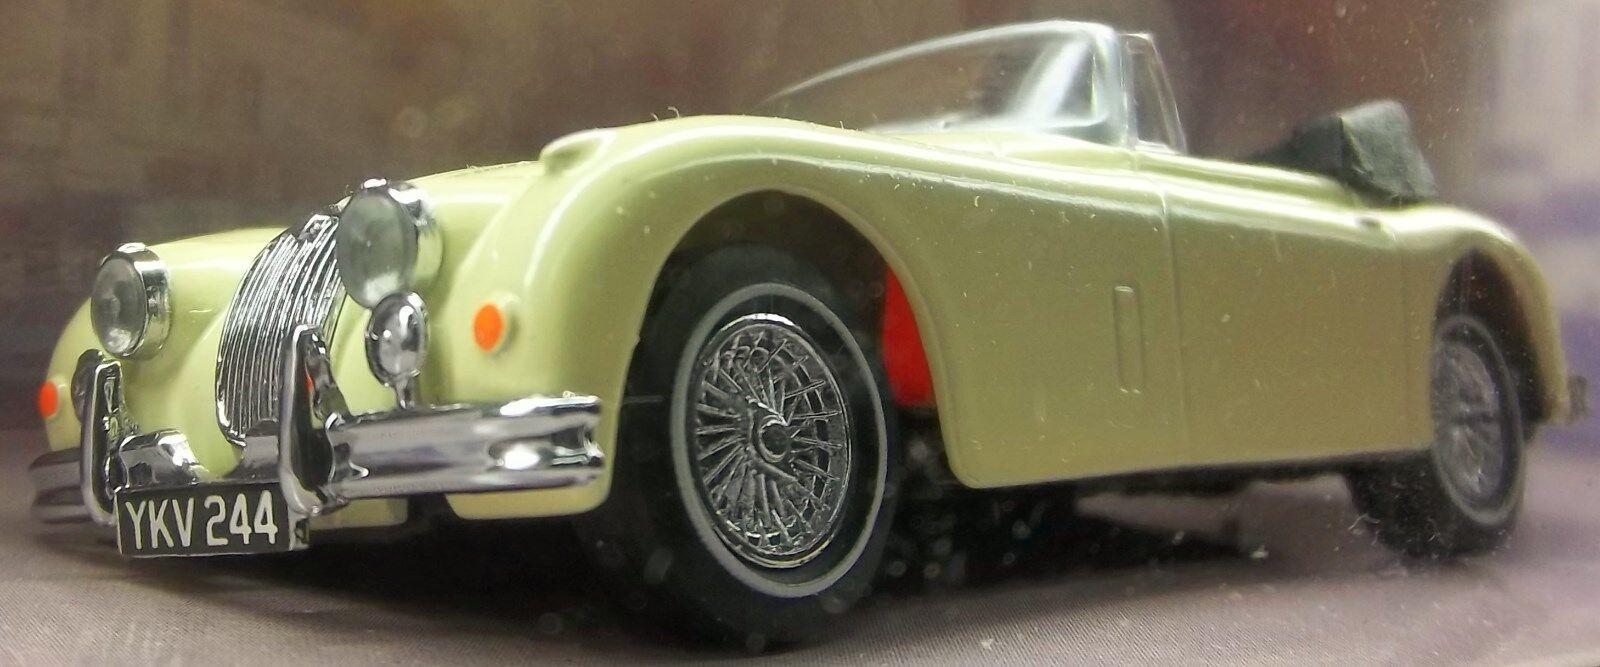 1 JAGUAR 150 XK CREAM CONgreenIBLE DINKY Cream On Red 1960 DROPHEAD JAGUAR XK-150